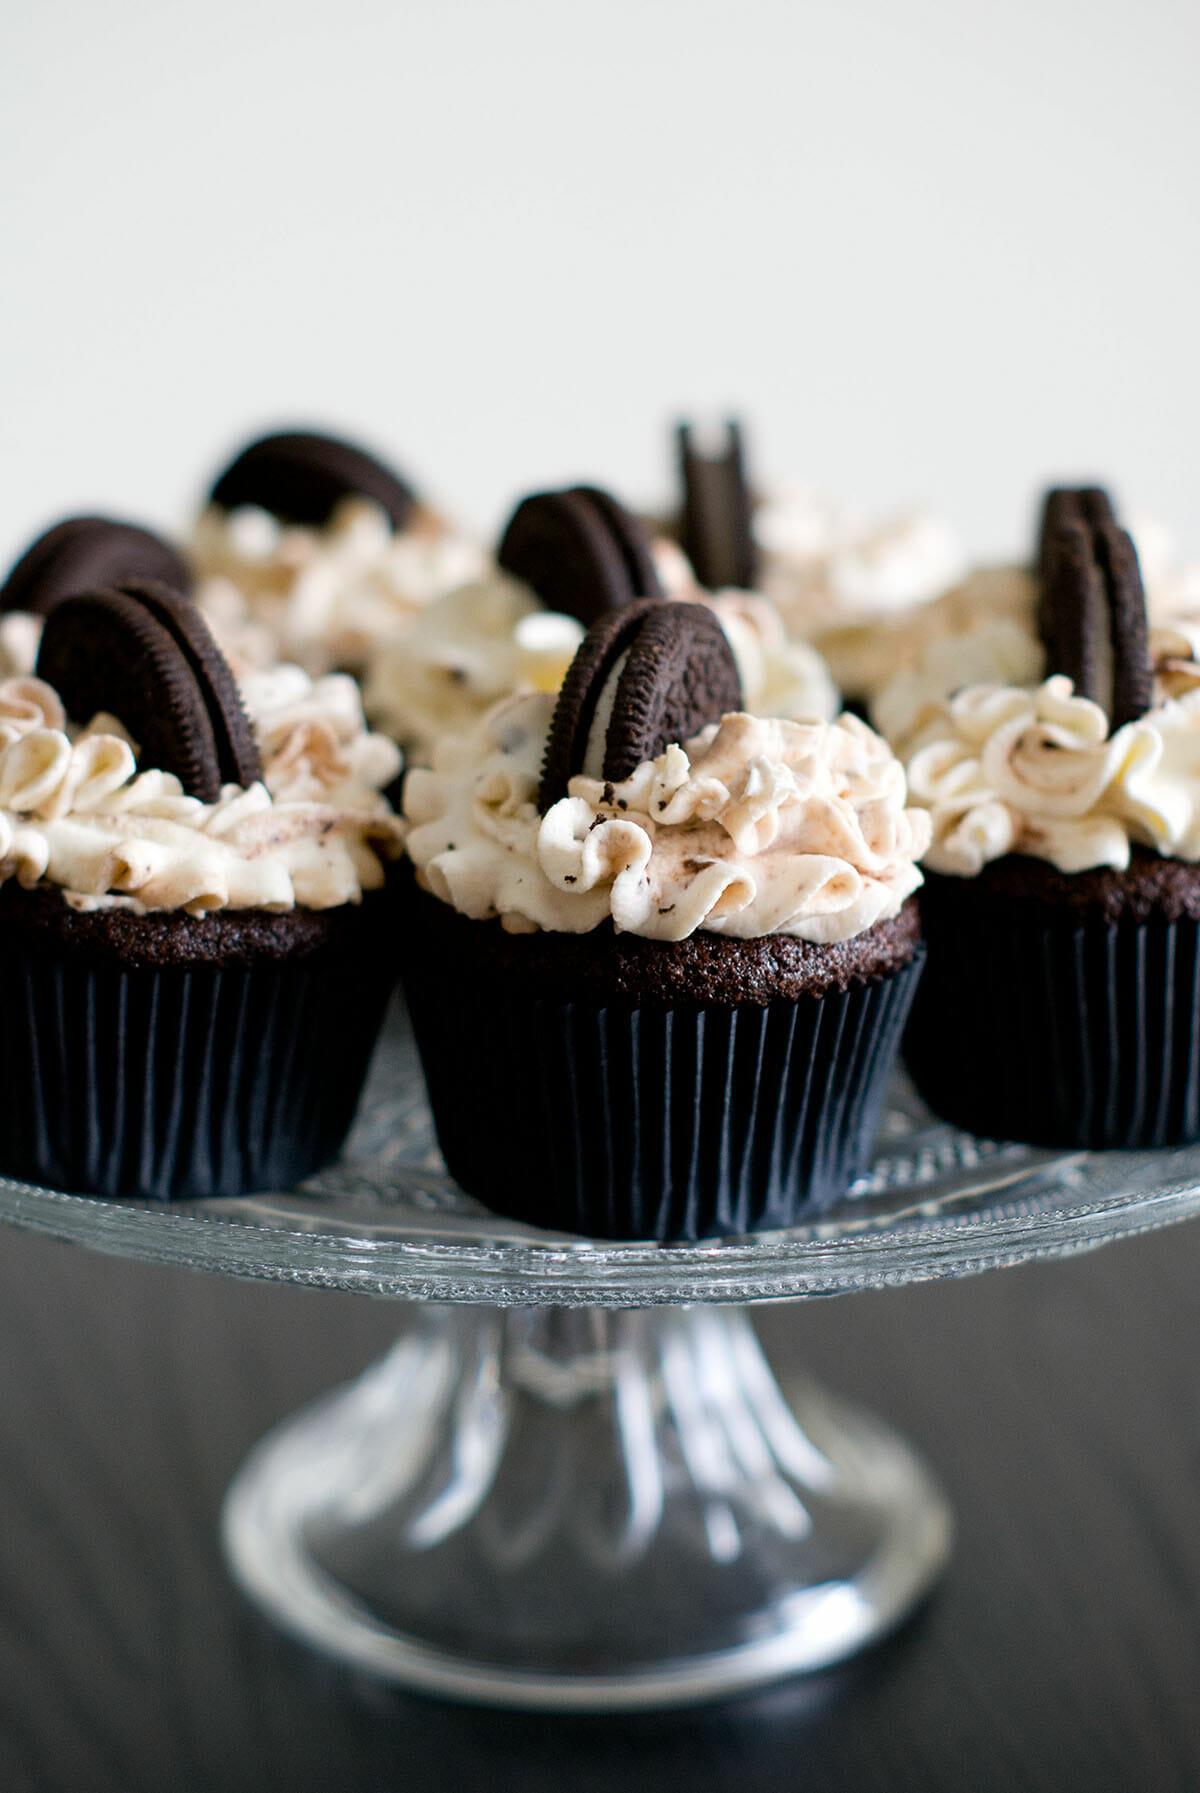 Des cupcakes